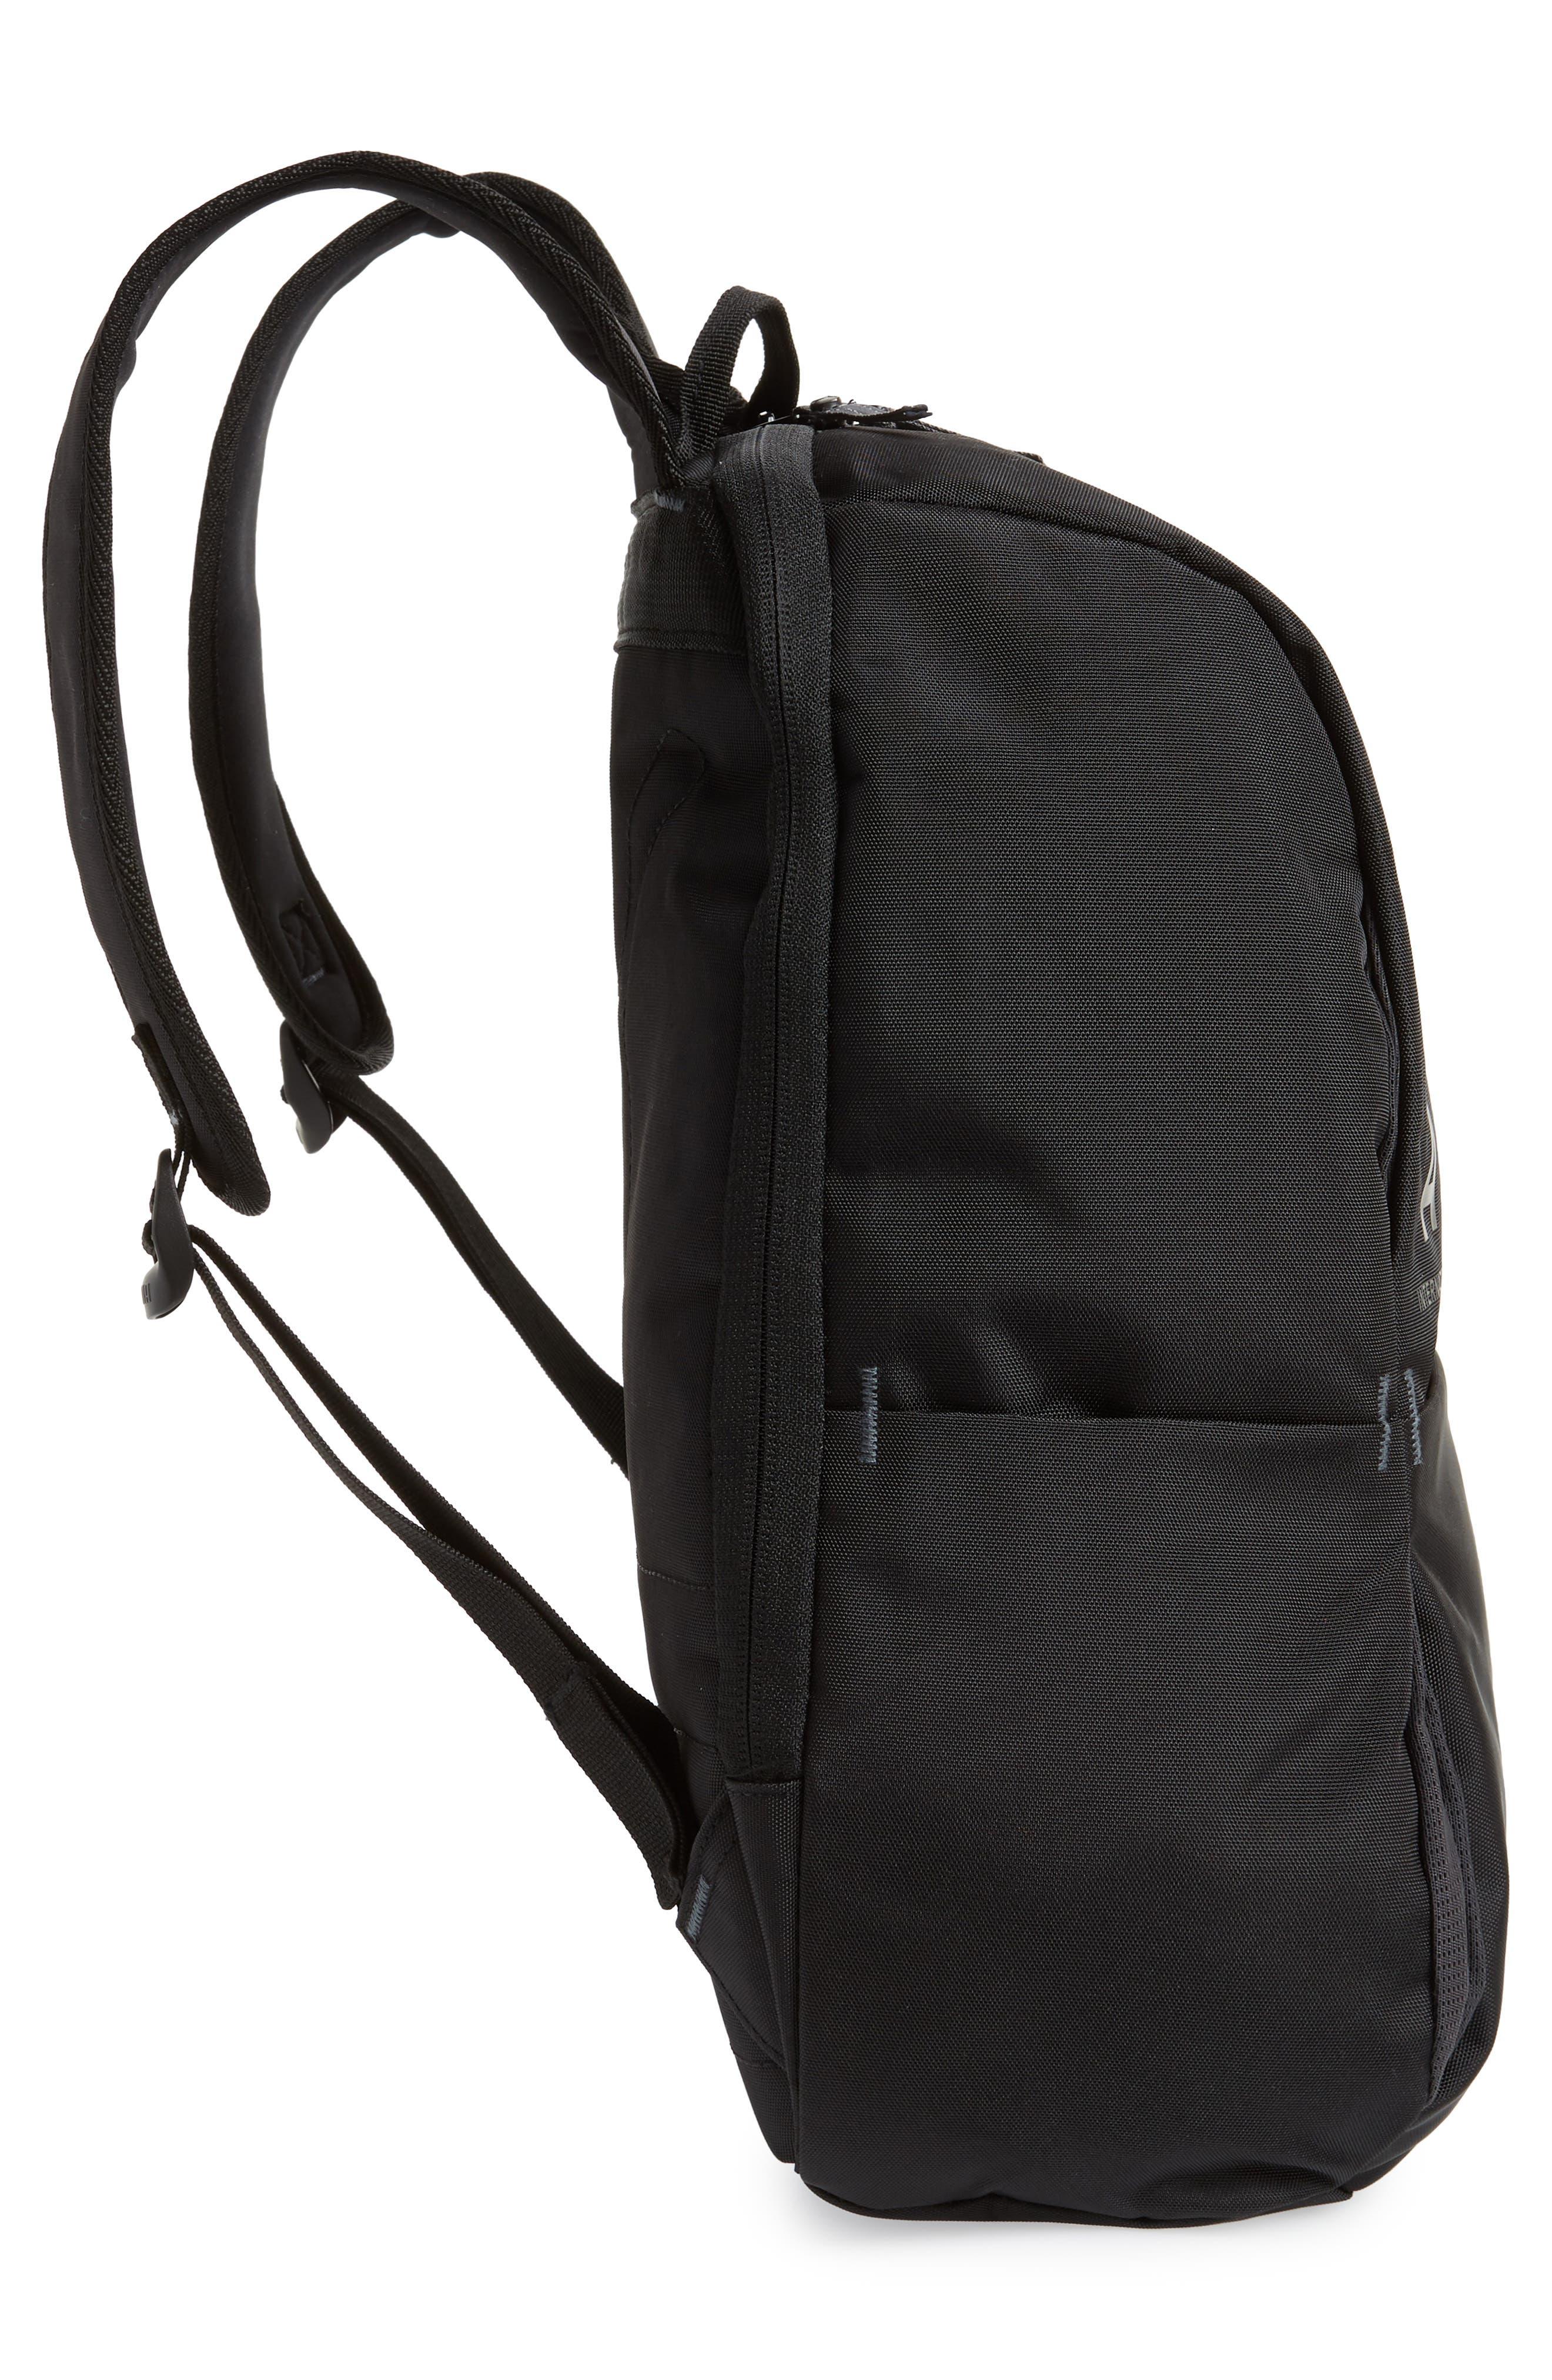 Ace Backpack,                             Alternate thumbnail 5, color,                             BLACK